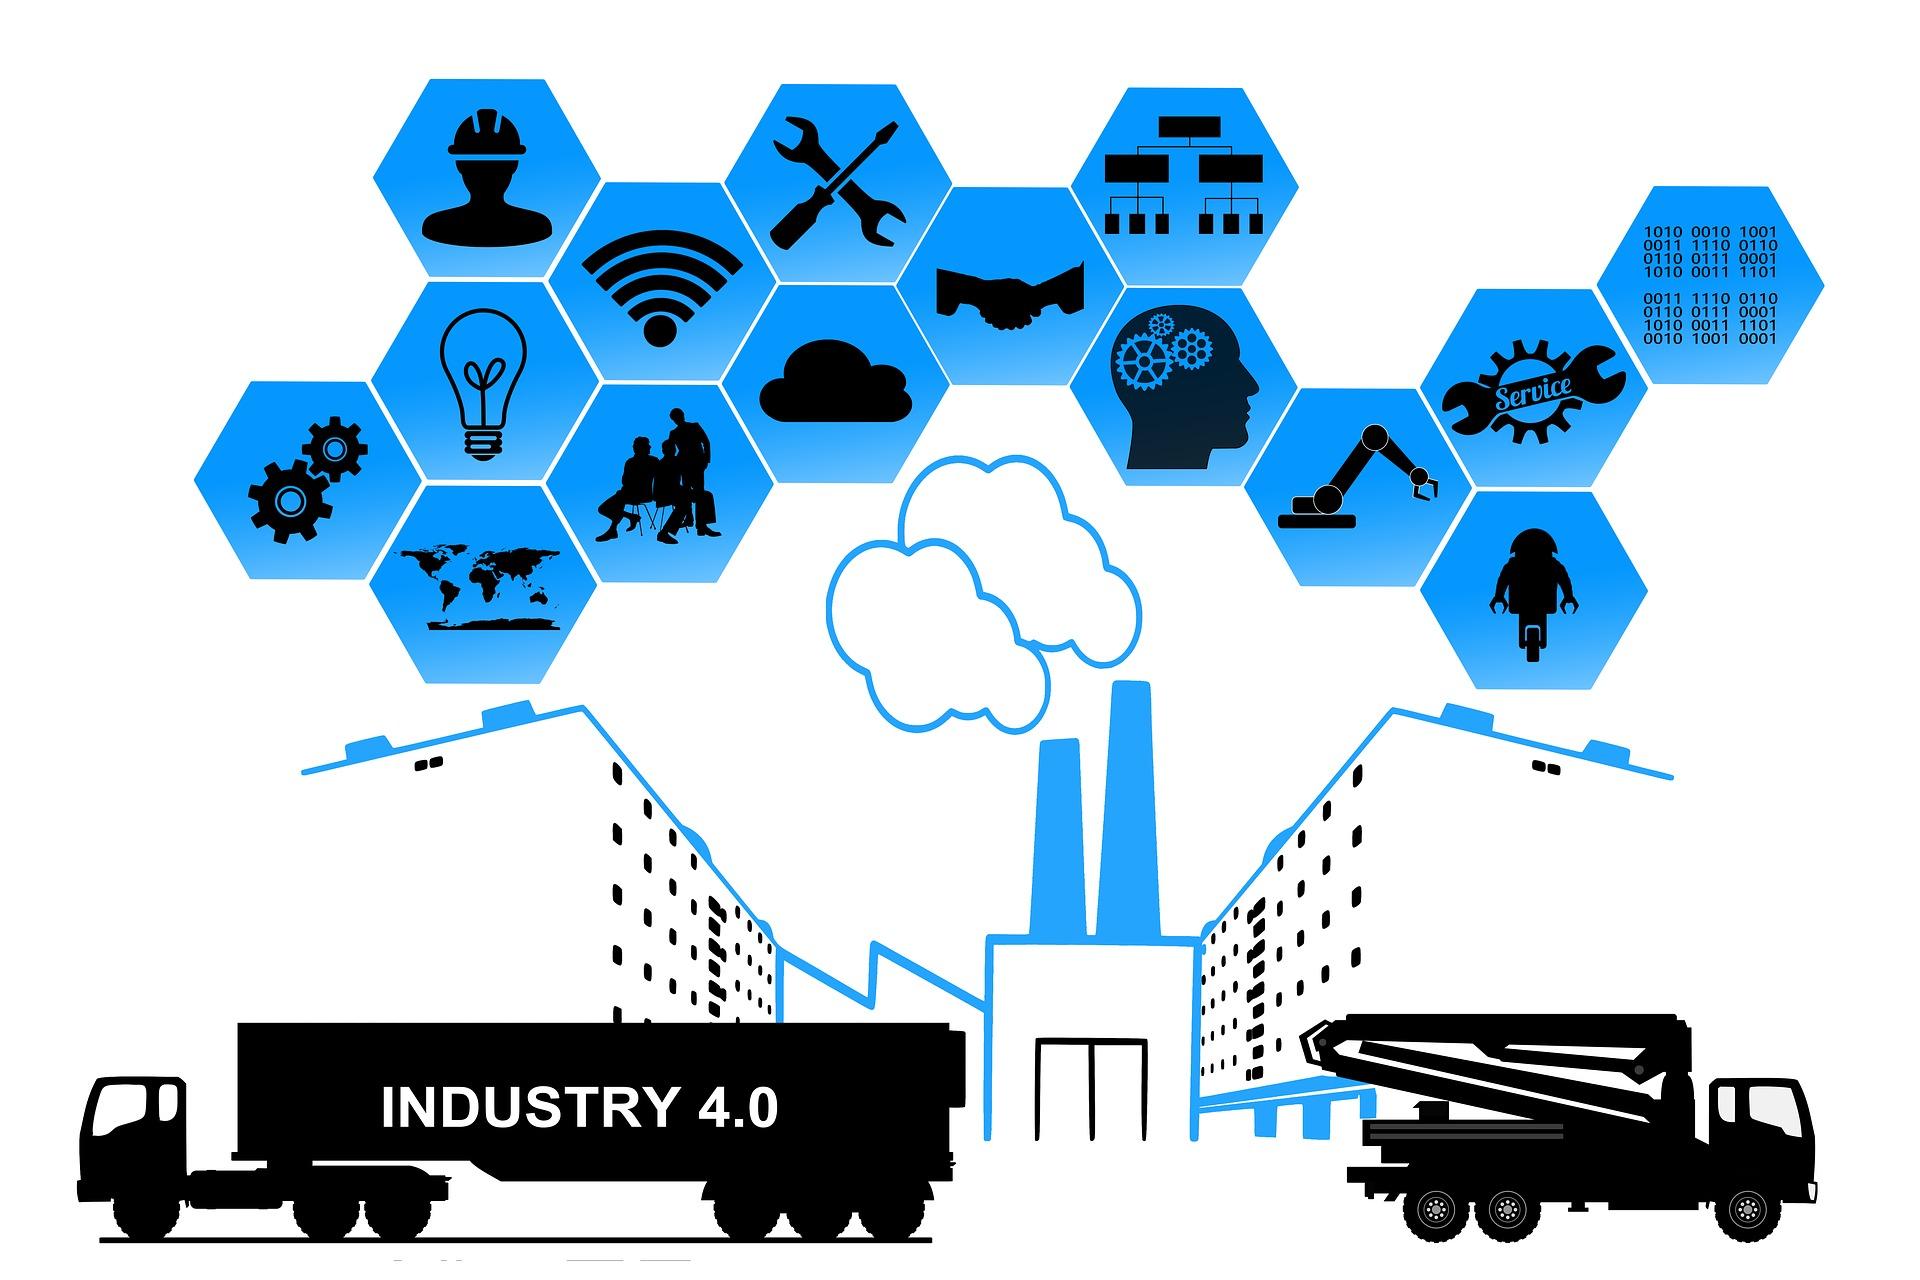 Making Sense of Industry 4.0